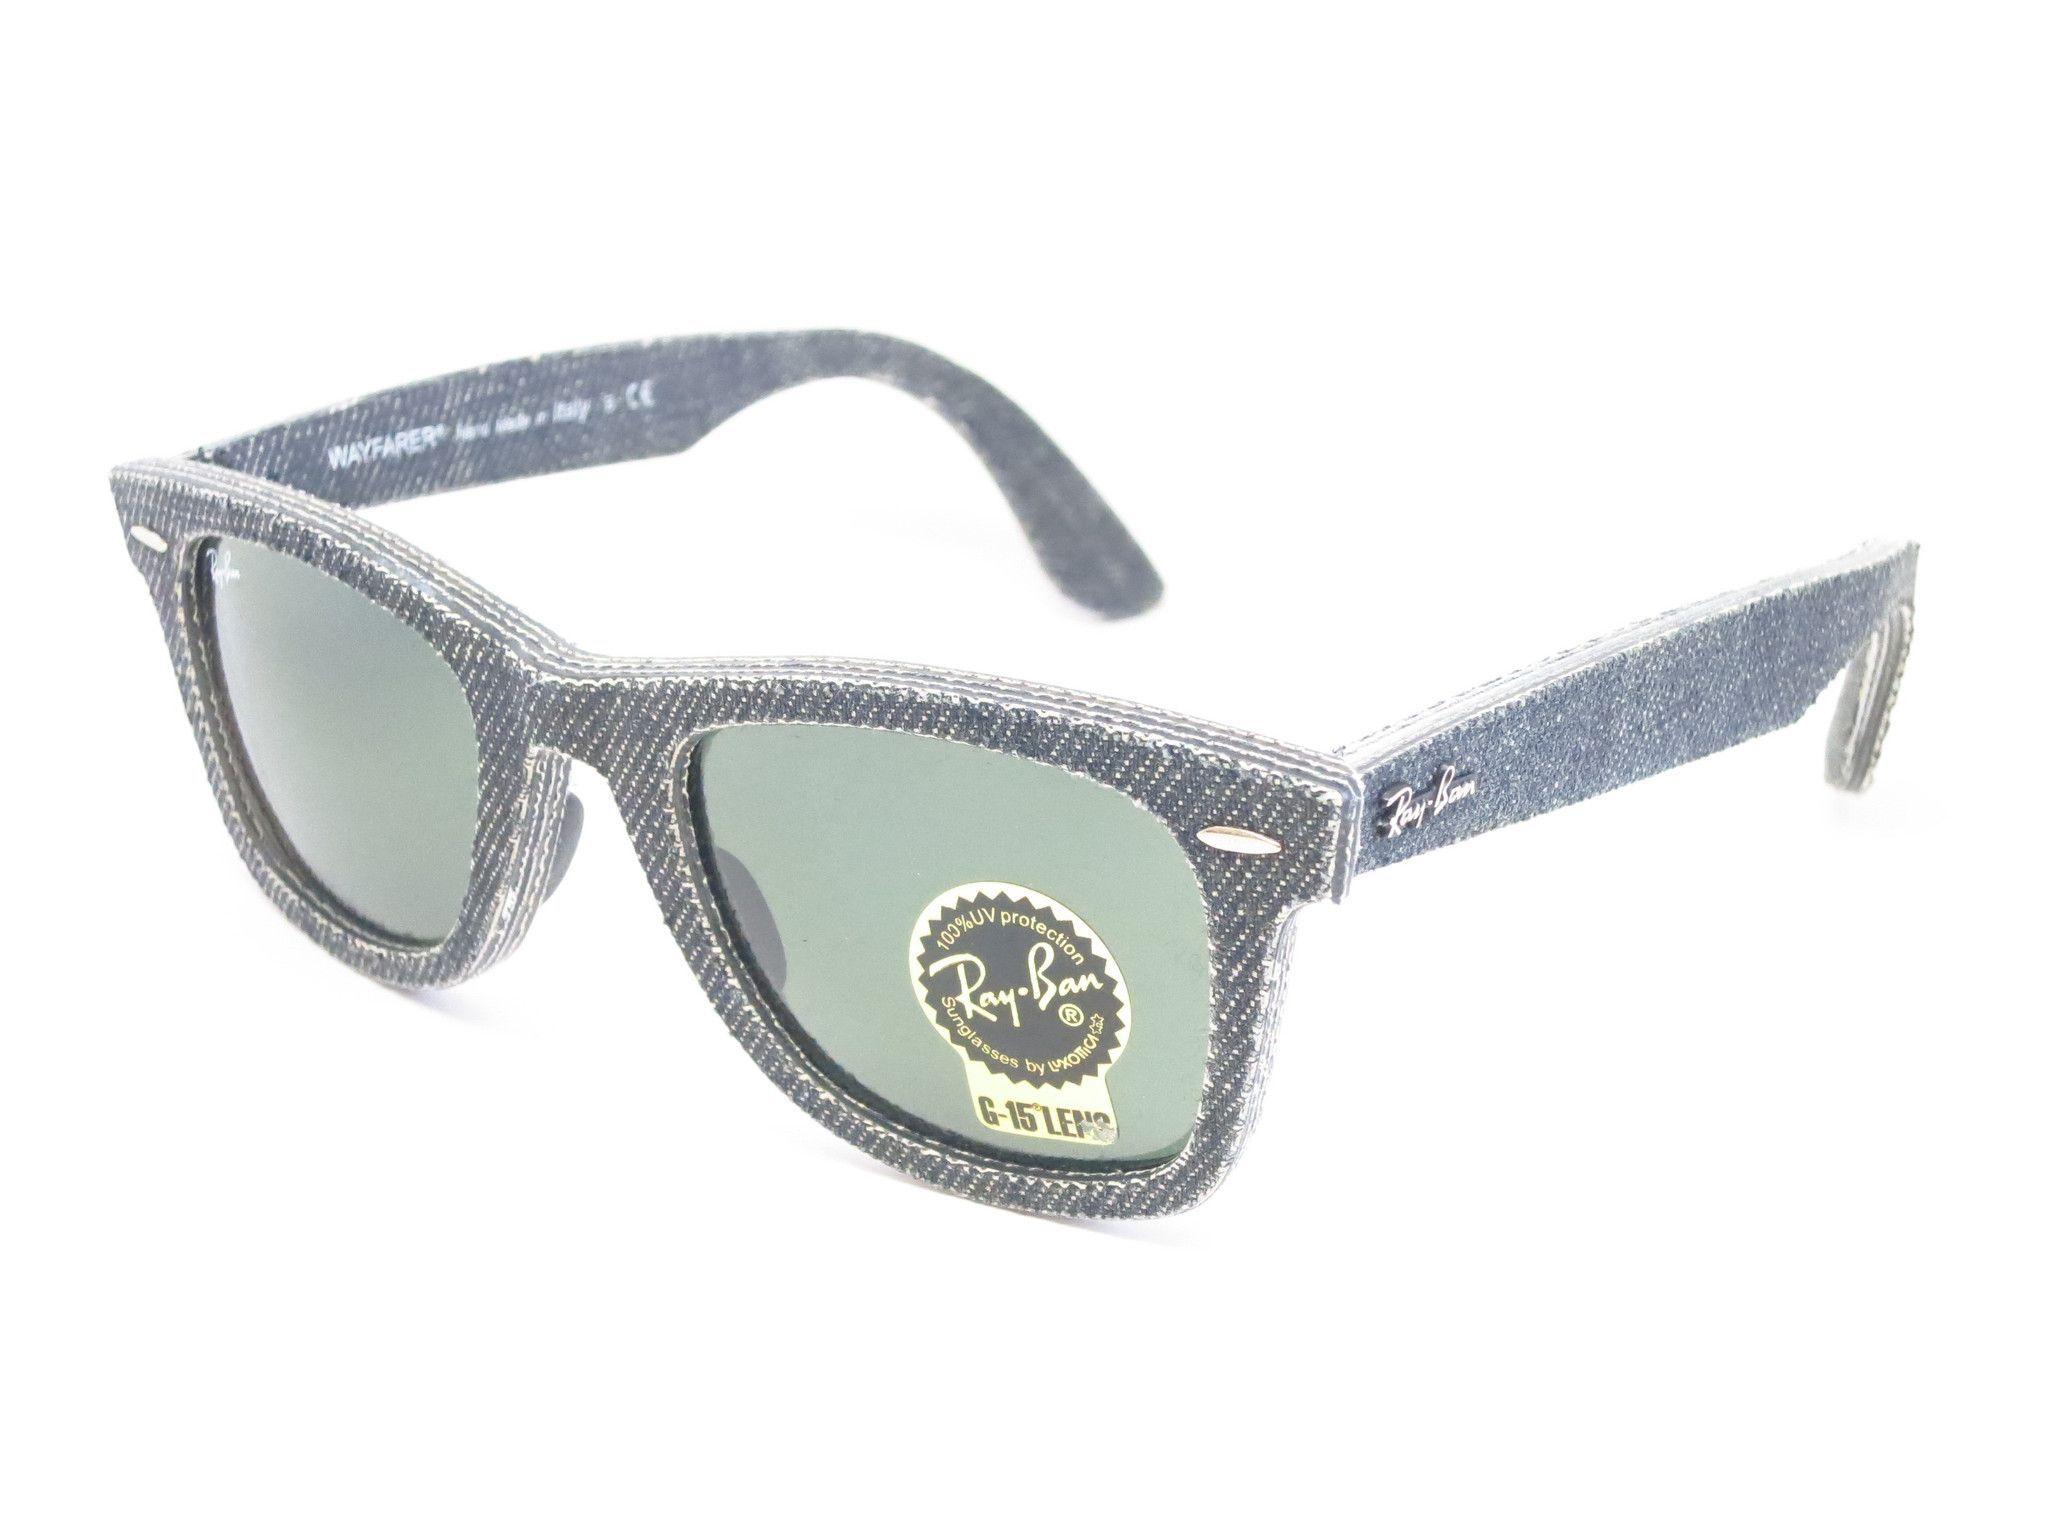 edf75447cd Ray-Ban RB 2140 Original Wayfarer 1162 Jeans Black Sunglasses ...